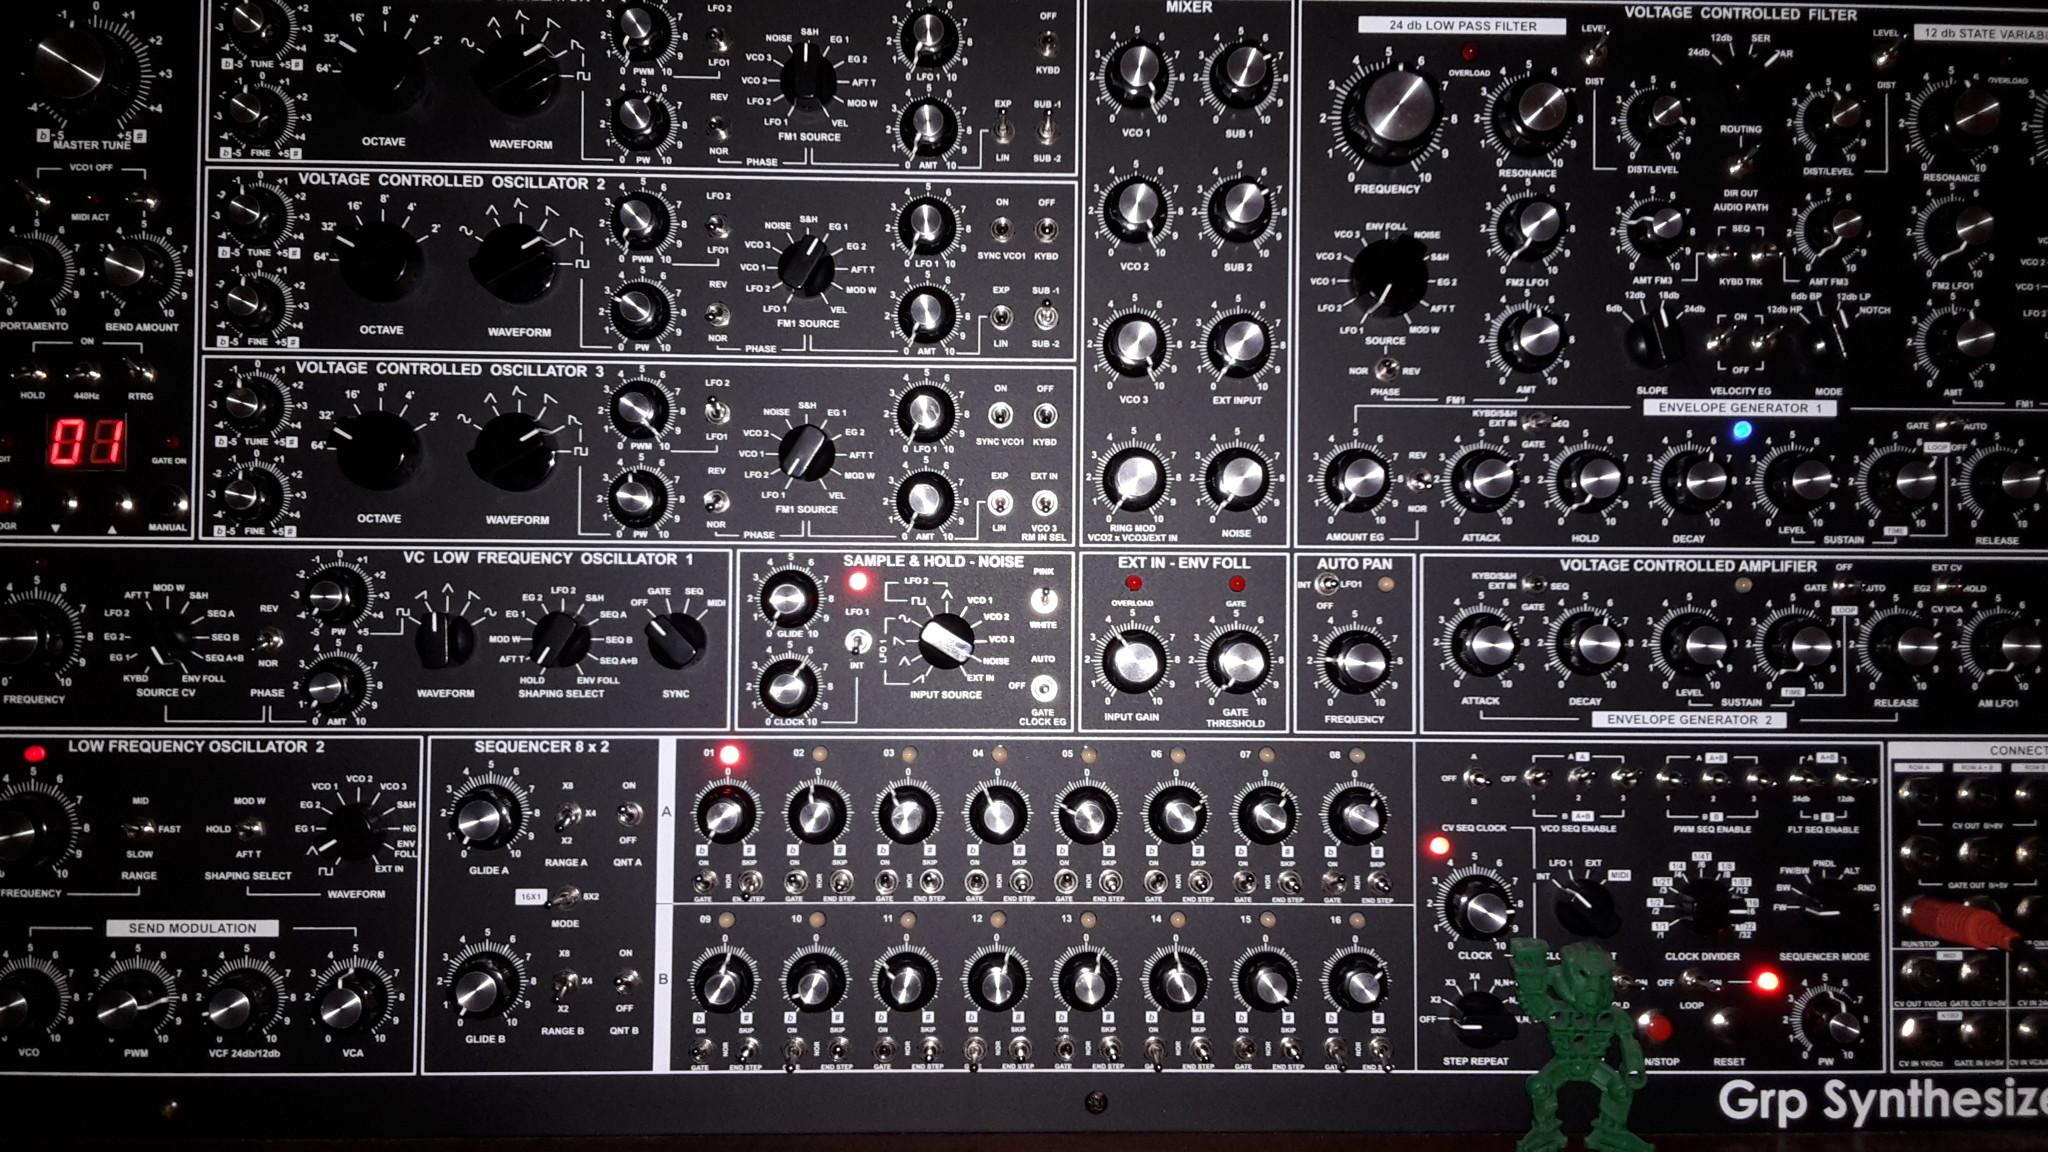 Modular Synthesizer Wallpaper Backgrounds   Larutadelsorigens 2048x1152